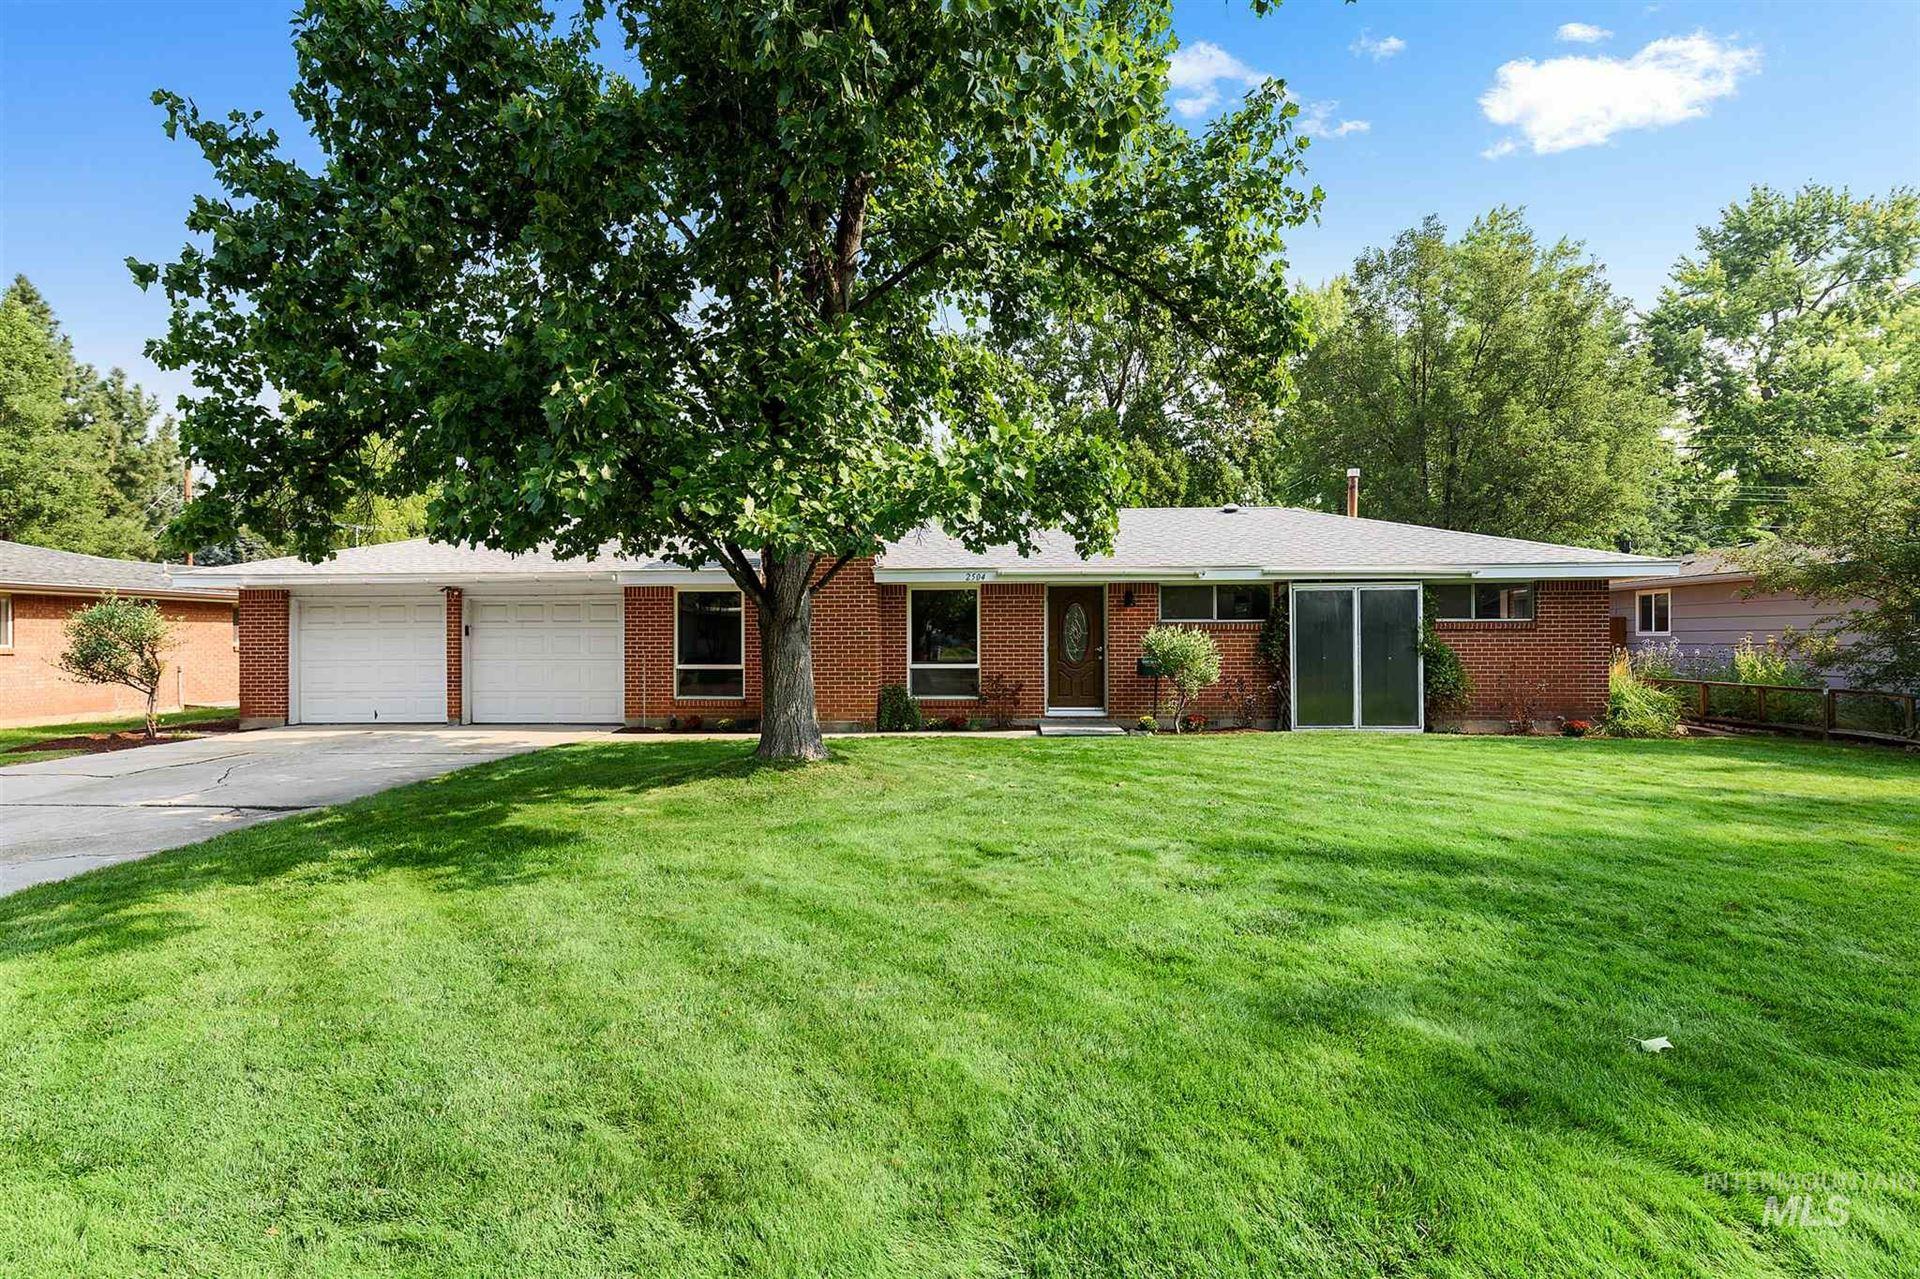 2504 N Redway Rd, Boise, ID 83704 - MLS#: 98779210